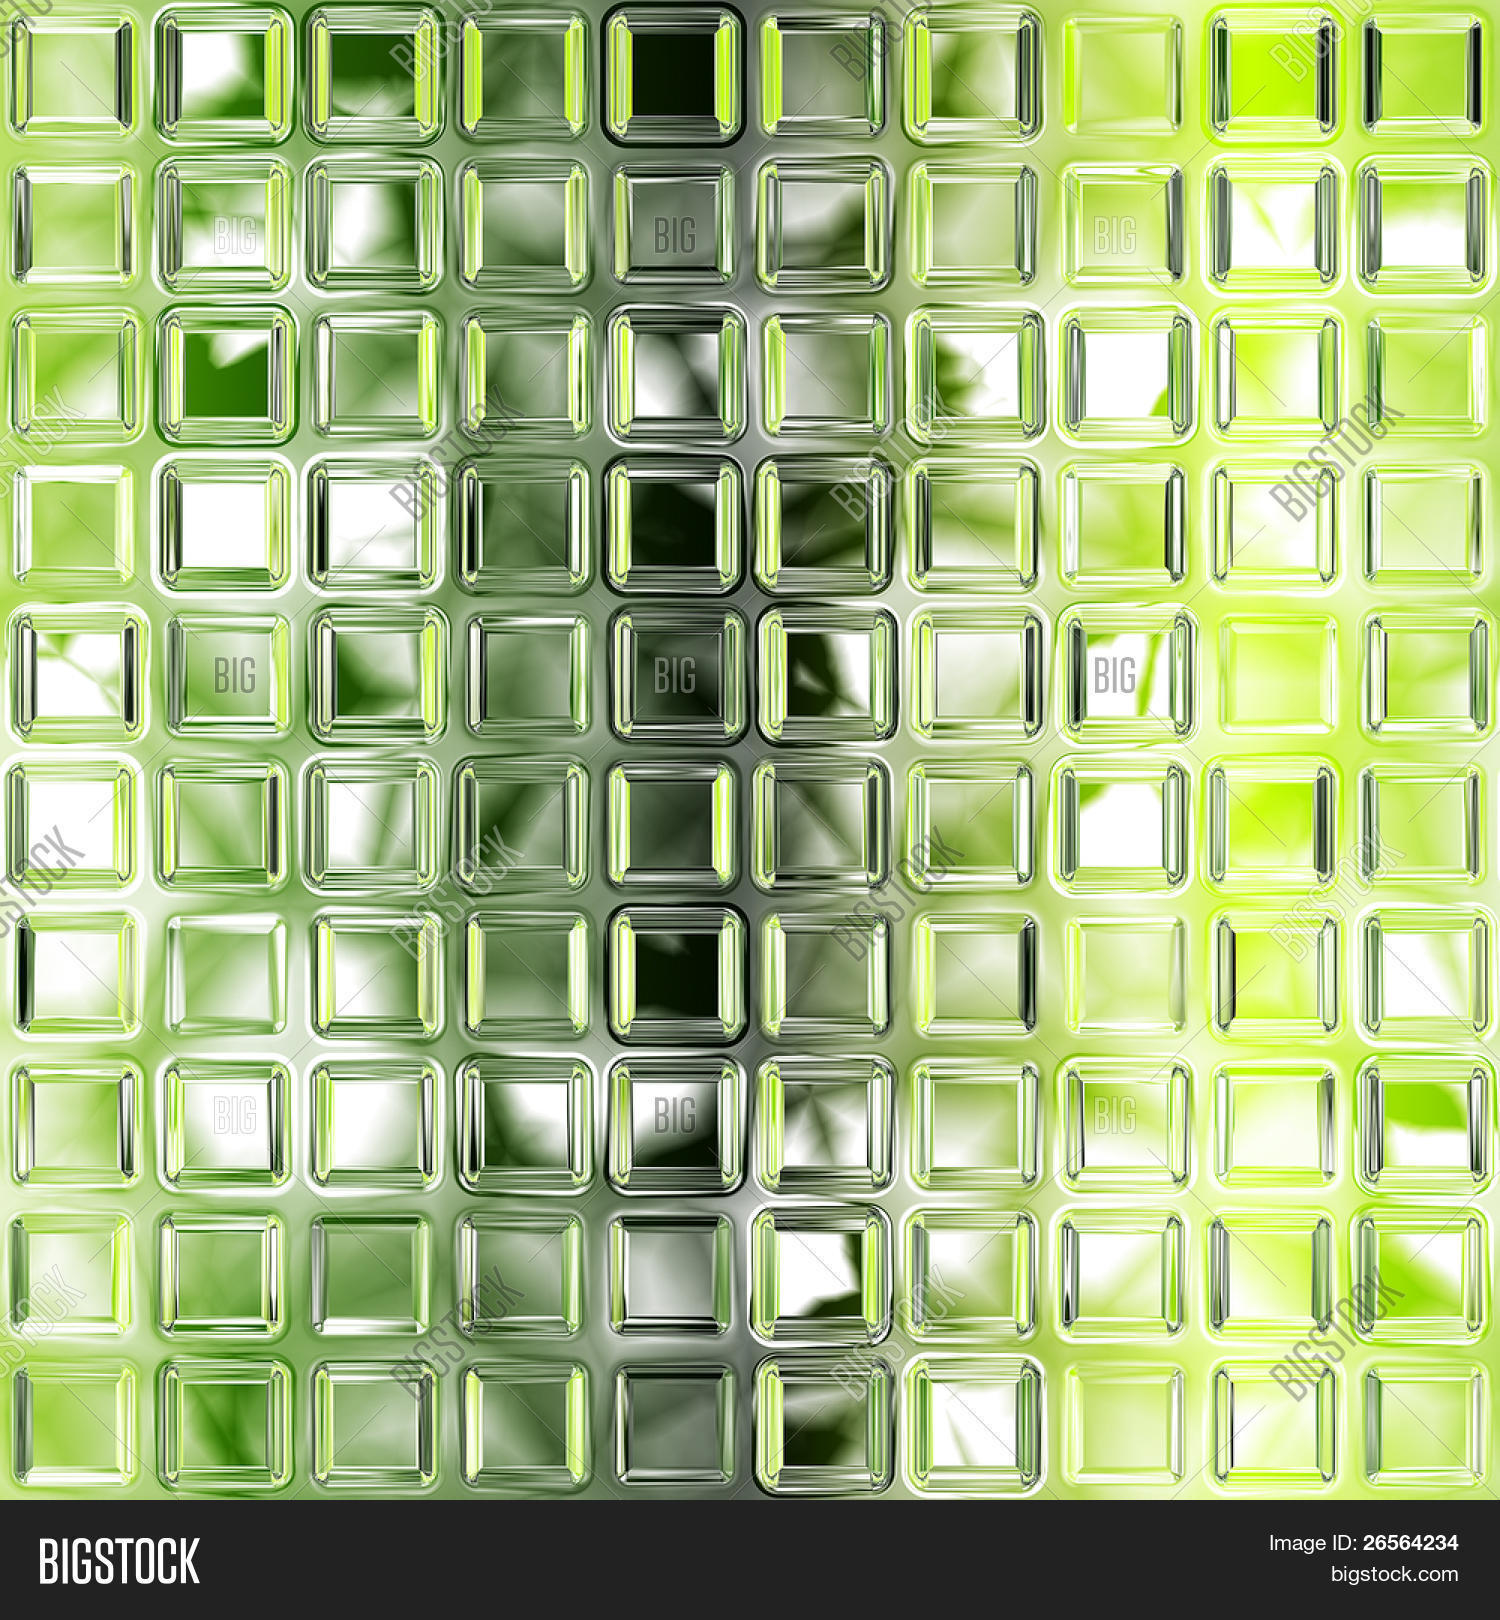 Green tiles kitchen texture - Seamless Green Glass Tiles Texture Background Kitchen Or Bathroom Concept